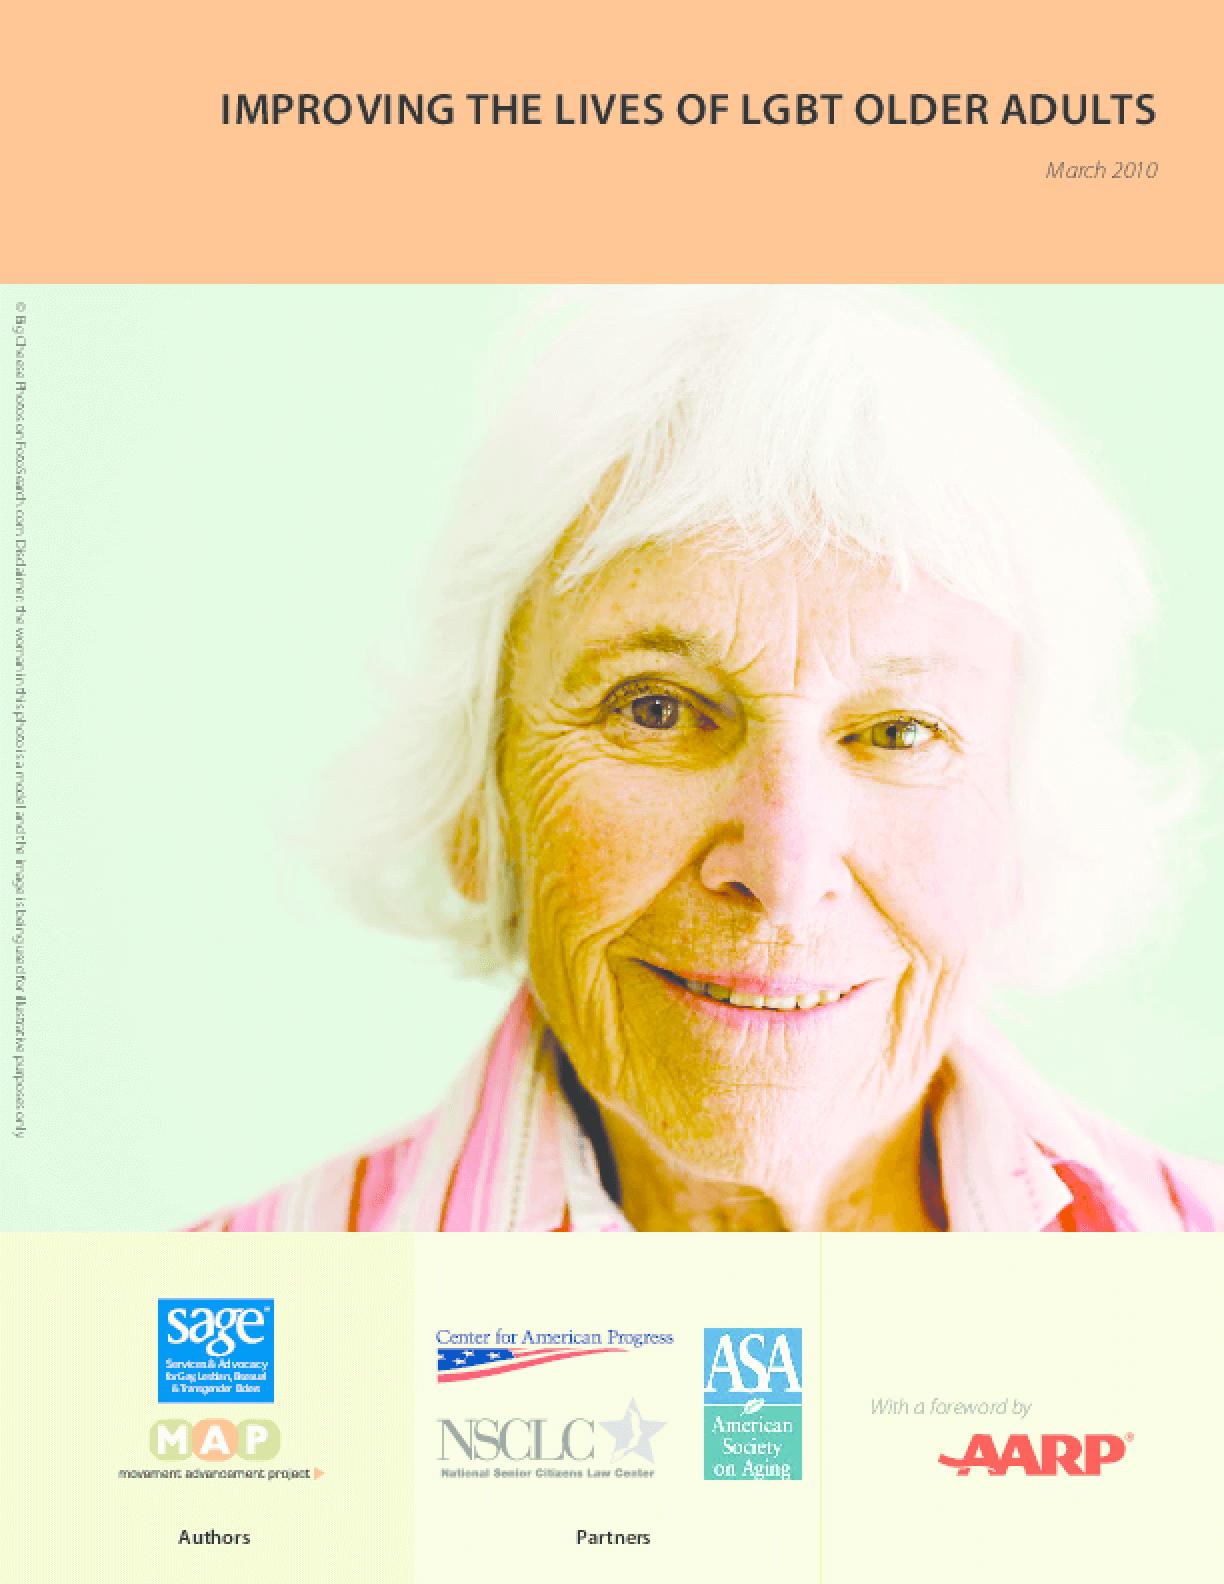 Improving the Lives of LGBT Older Adults